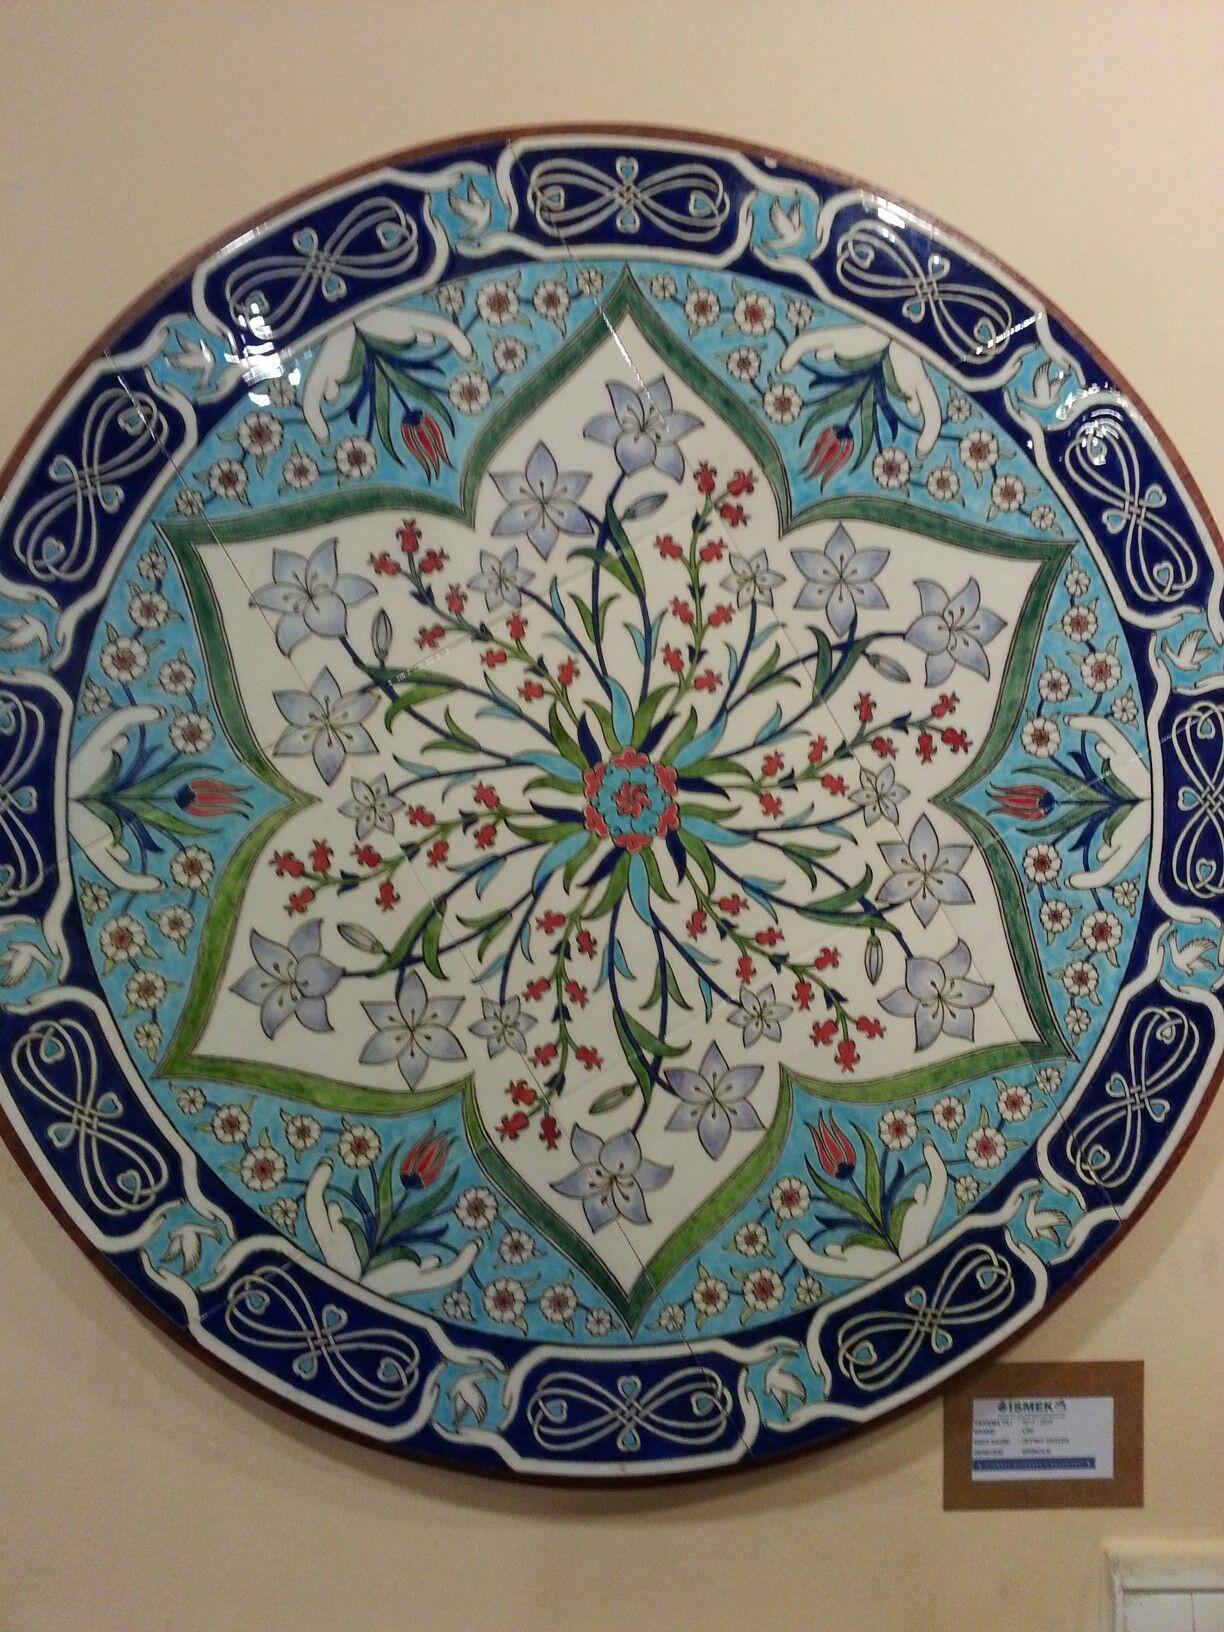 Turkish Tiles Ceramic Plates Ancient Art Porcelain Tiles Islamic Art Ottoman Turkey Decorative Plates Good Ideas & Pin by Oya Peker on ?znik | Pinterest | Islamic art Turkish tiles ...